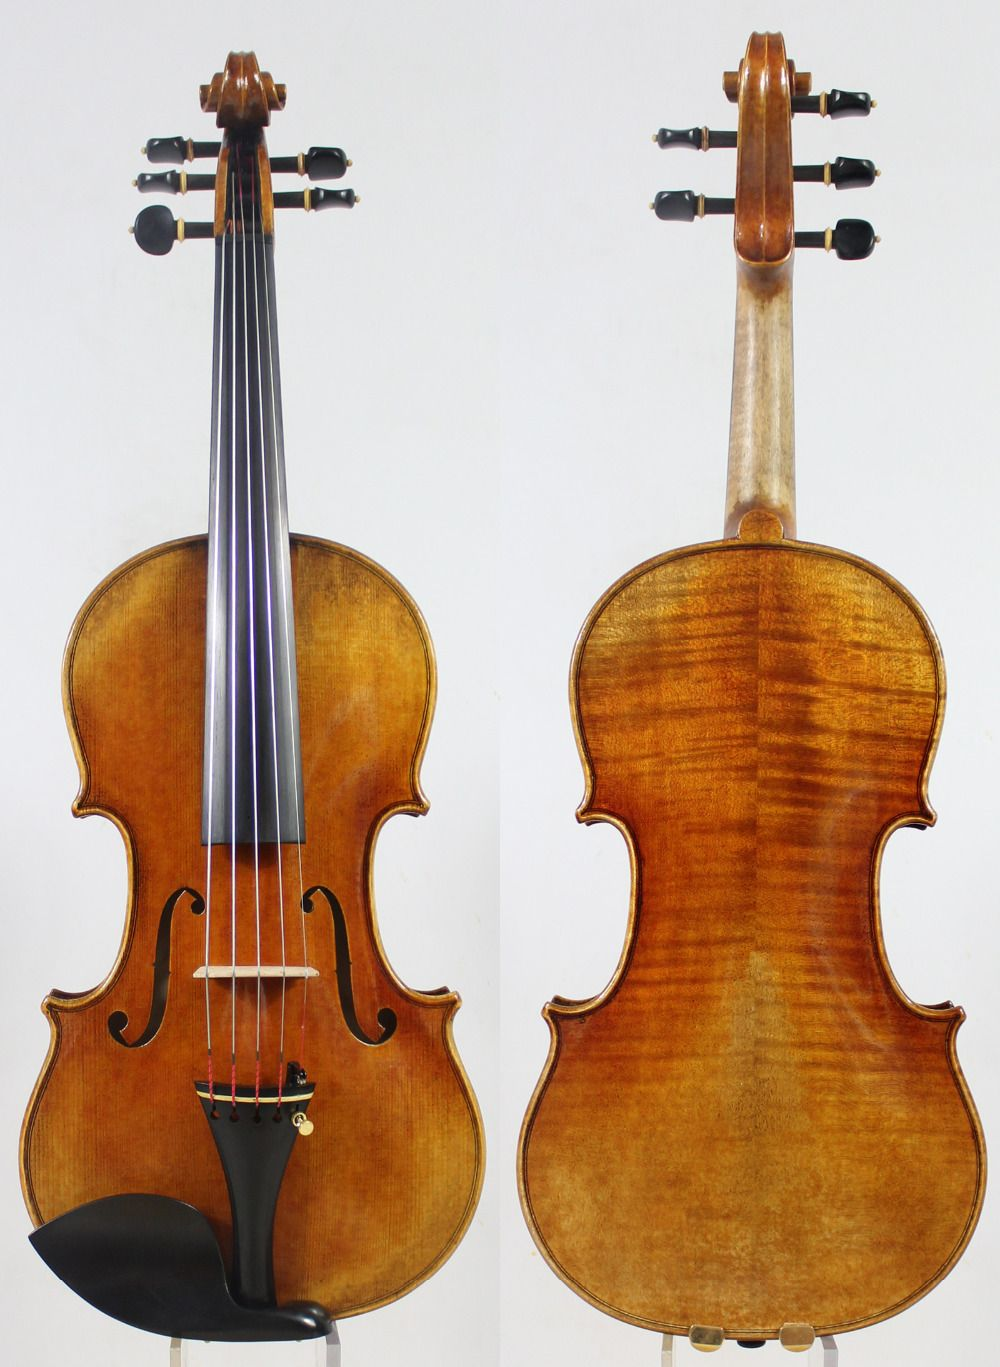 5 Strings Violin violino!Copy Stradivari 1715 Model! Antiqued oil vamish.Master Tone!Case Bow Rosin!Free Shipping!Aubert Bridge!